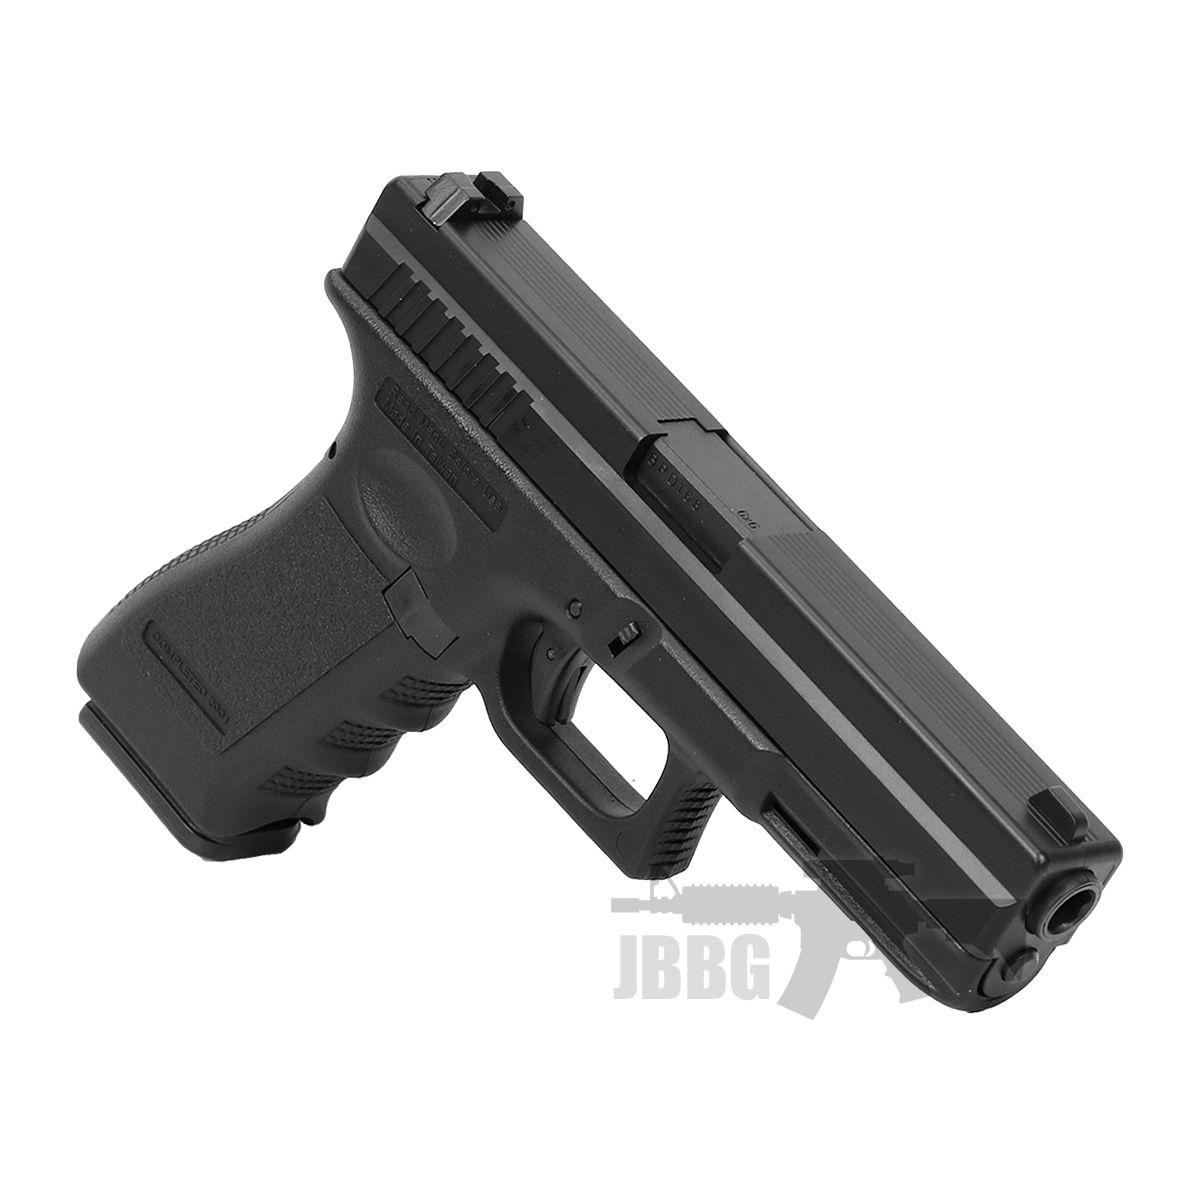 hg184 airsoft bb pistol 3